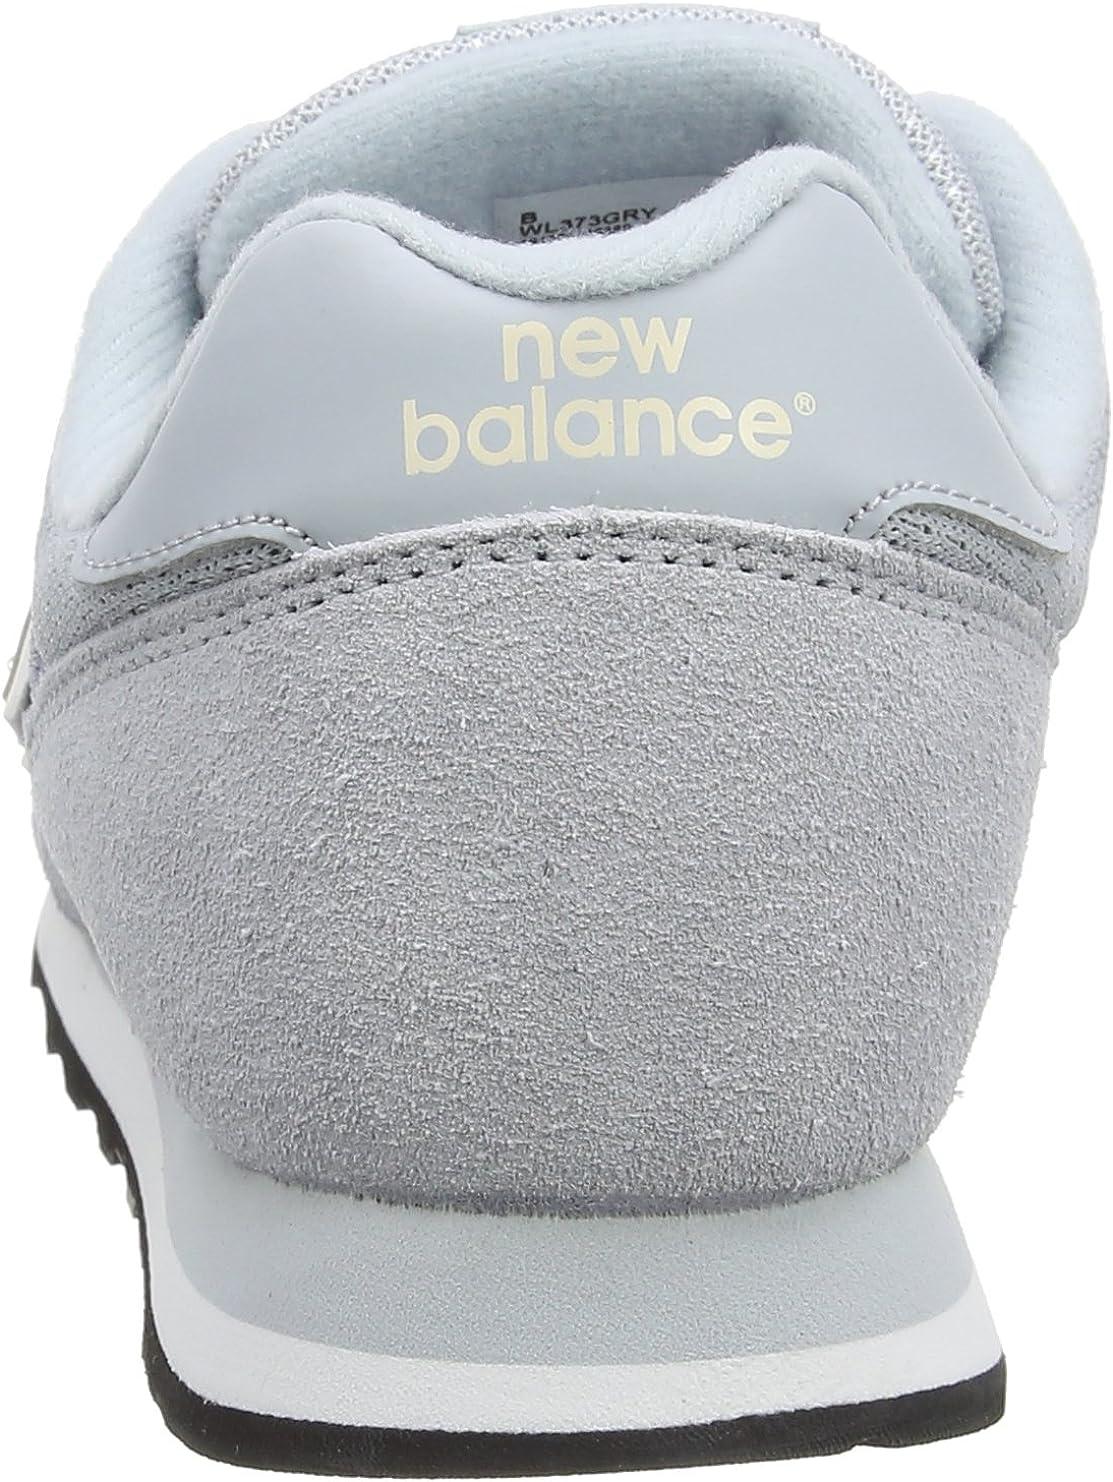 new balance baskets wl373gry